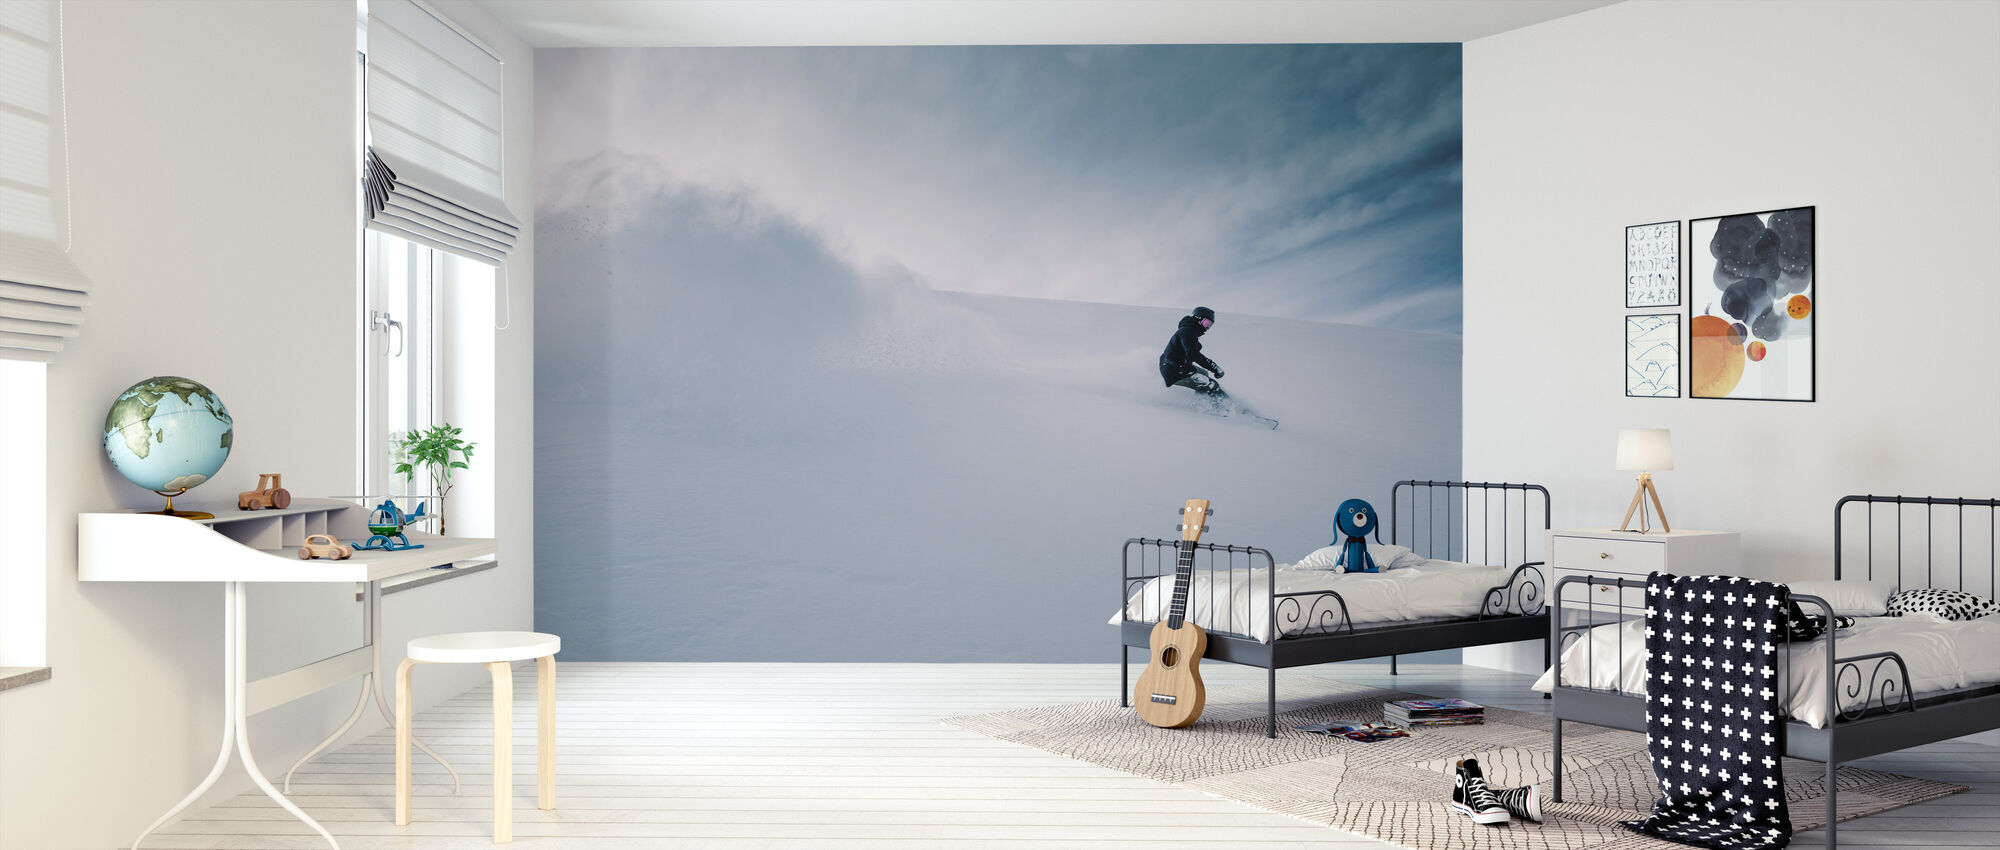 Snowboarder - Wallpaper - Kids Room